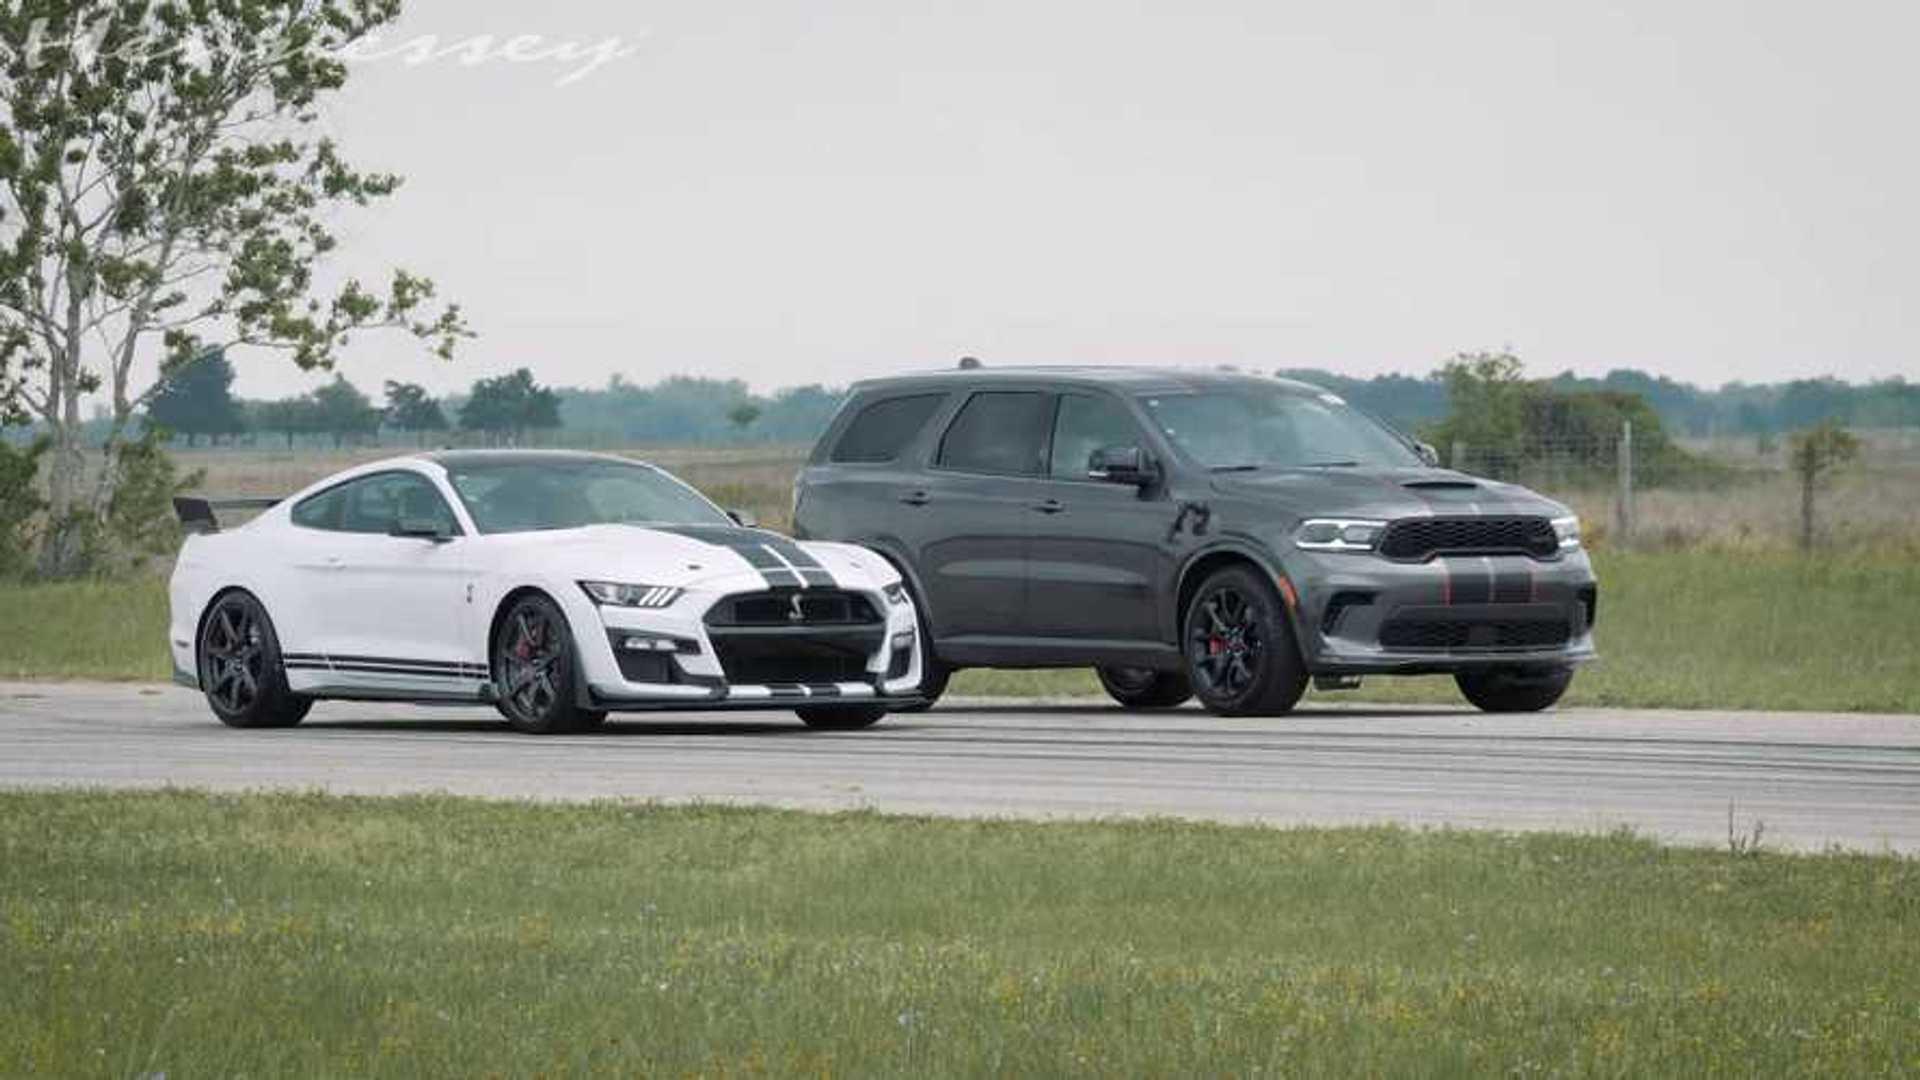 Durango Hellcat Shocks Shelby GT500 In Stock Vs Stock Drag Race - Motor1